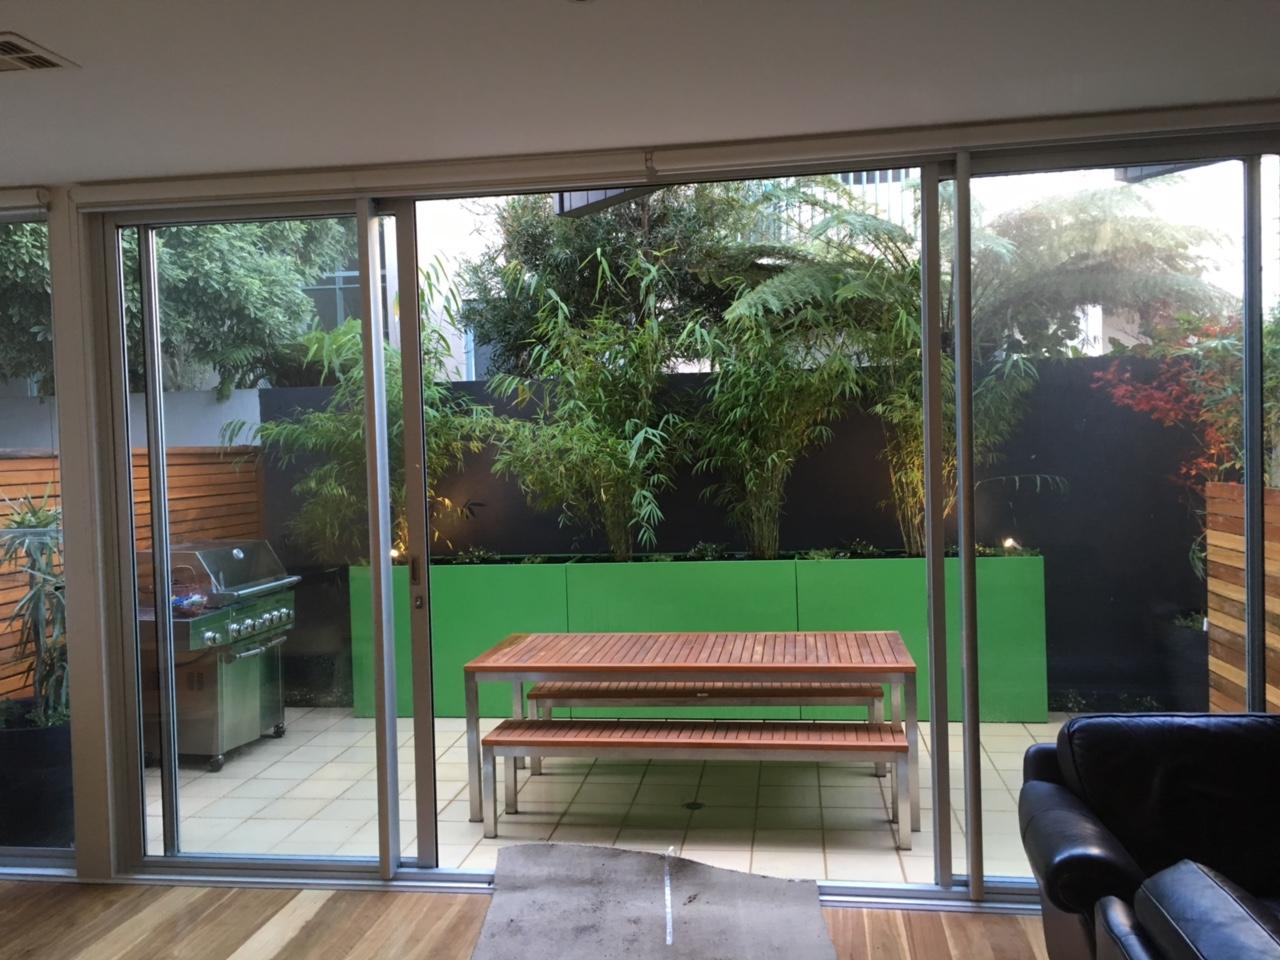 New Courtyard In Melbourne Small Spaces Garden Design